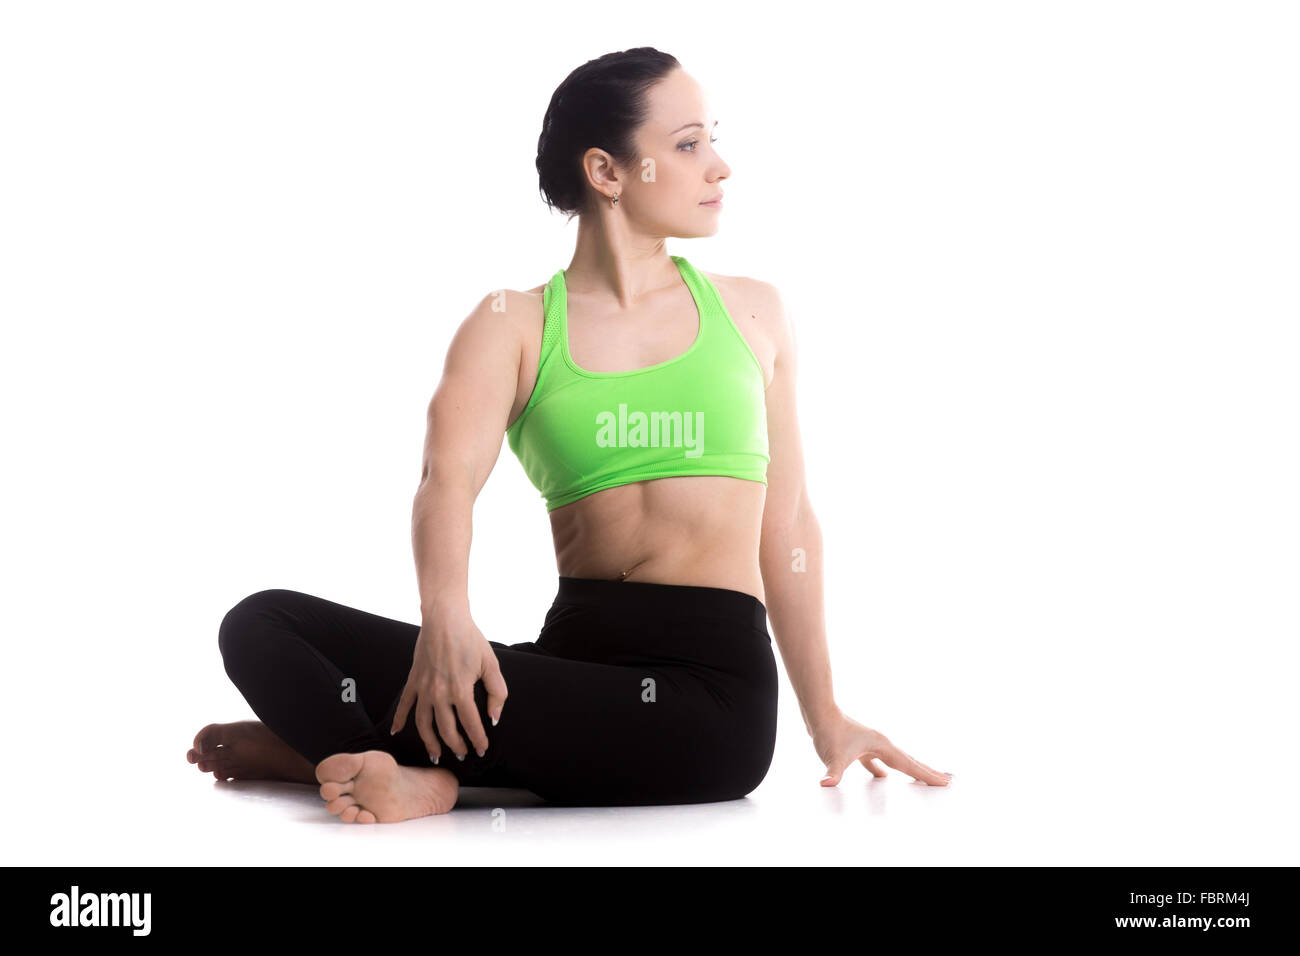 Serene girl practicing yoga, Revolved easy pose, gentle spinal twist, parivrtta sukhasana, asana for flexible spine - Stock Image